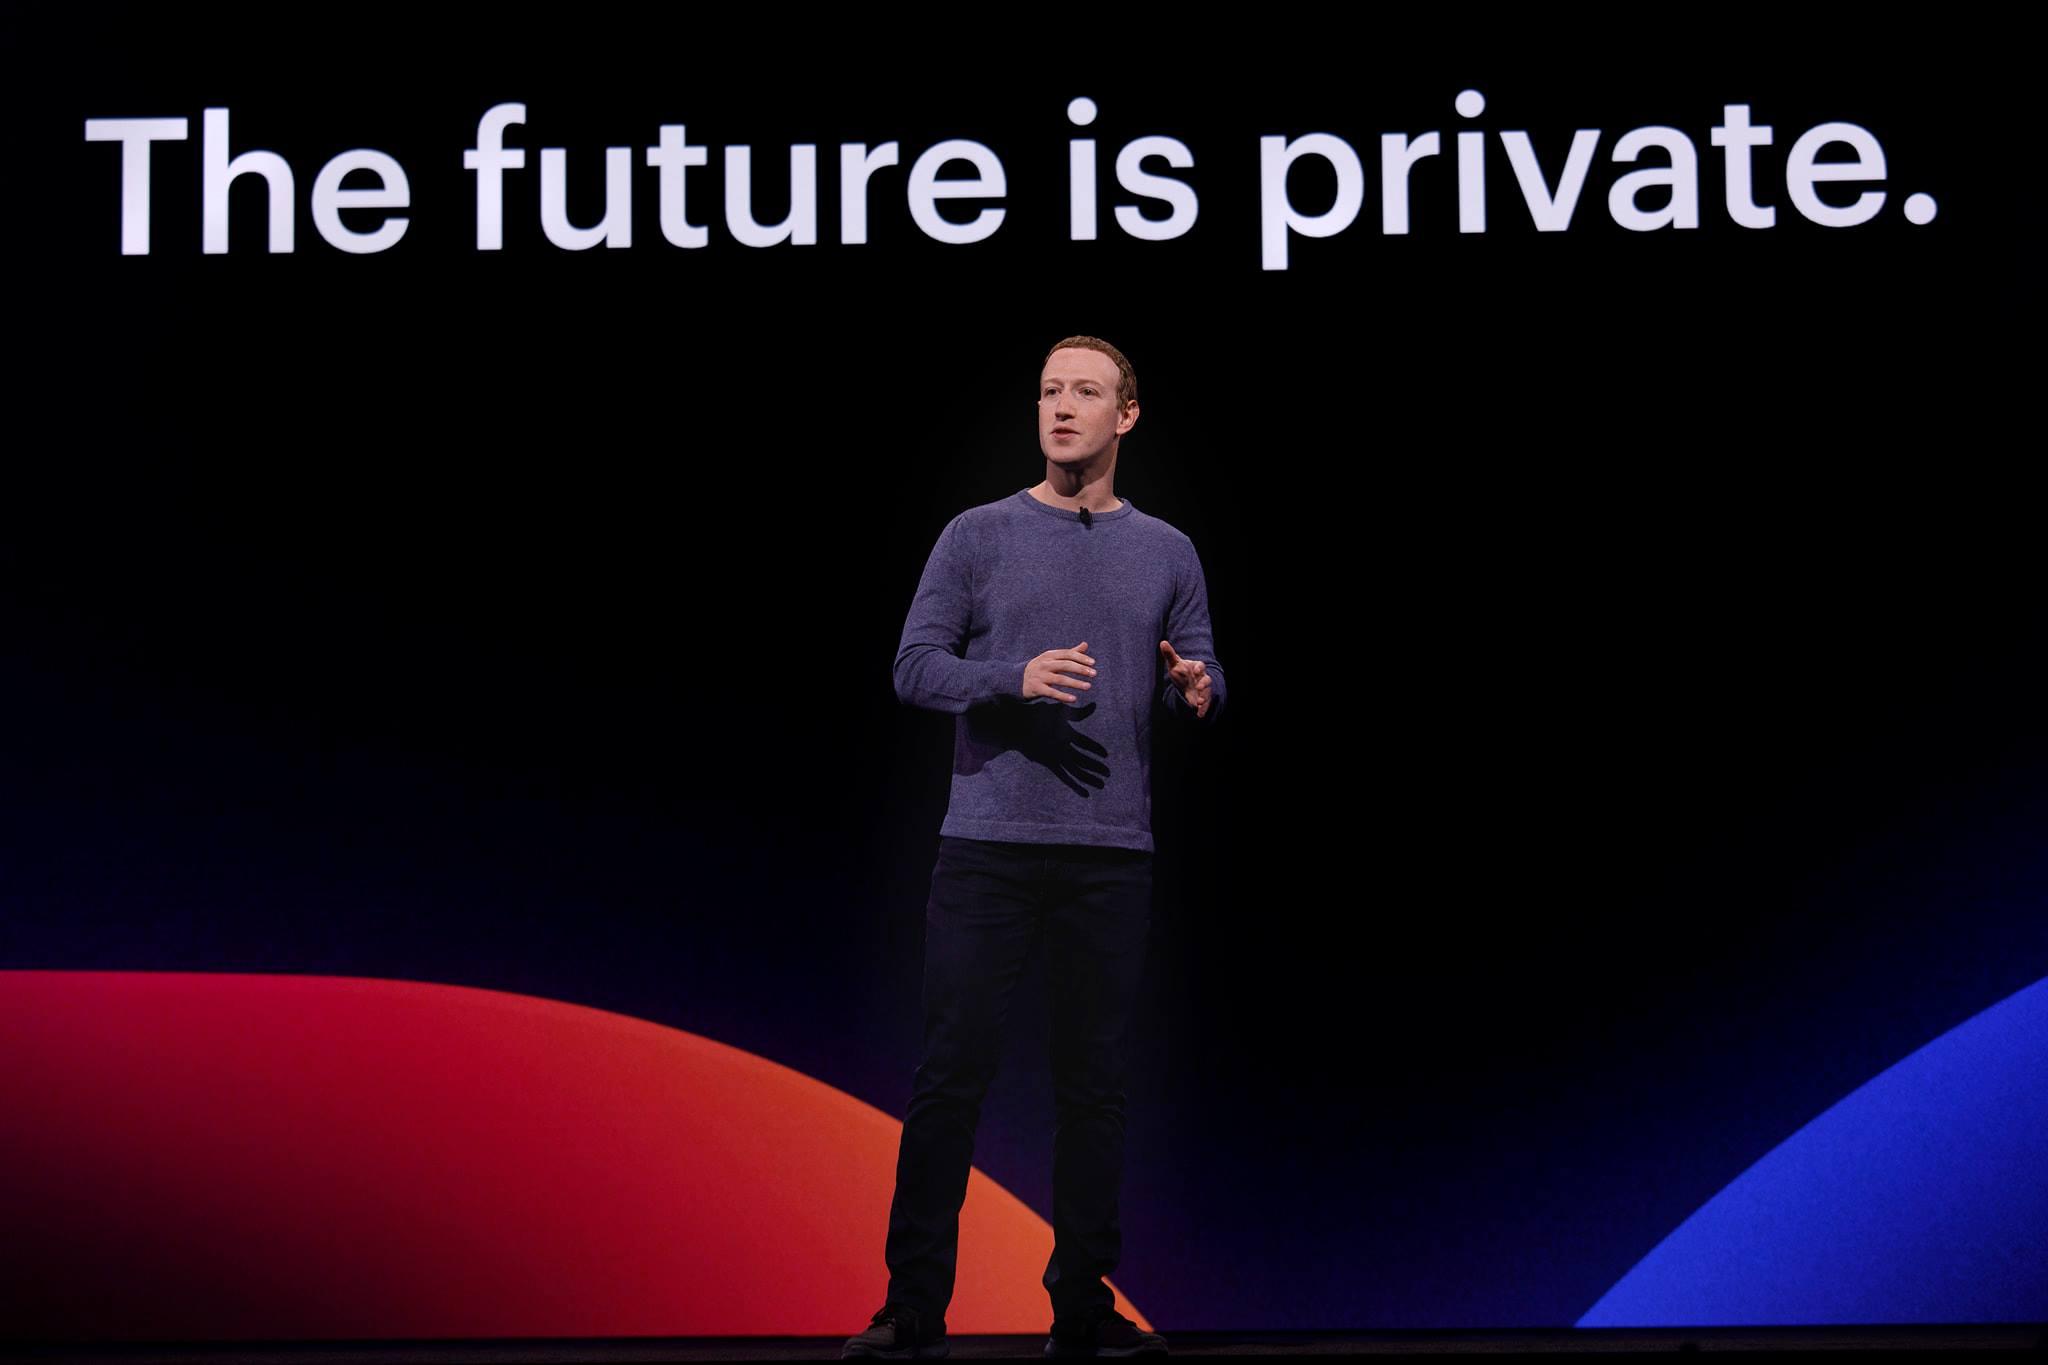 cheltuieli securitate zuckerberg